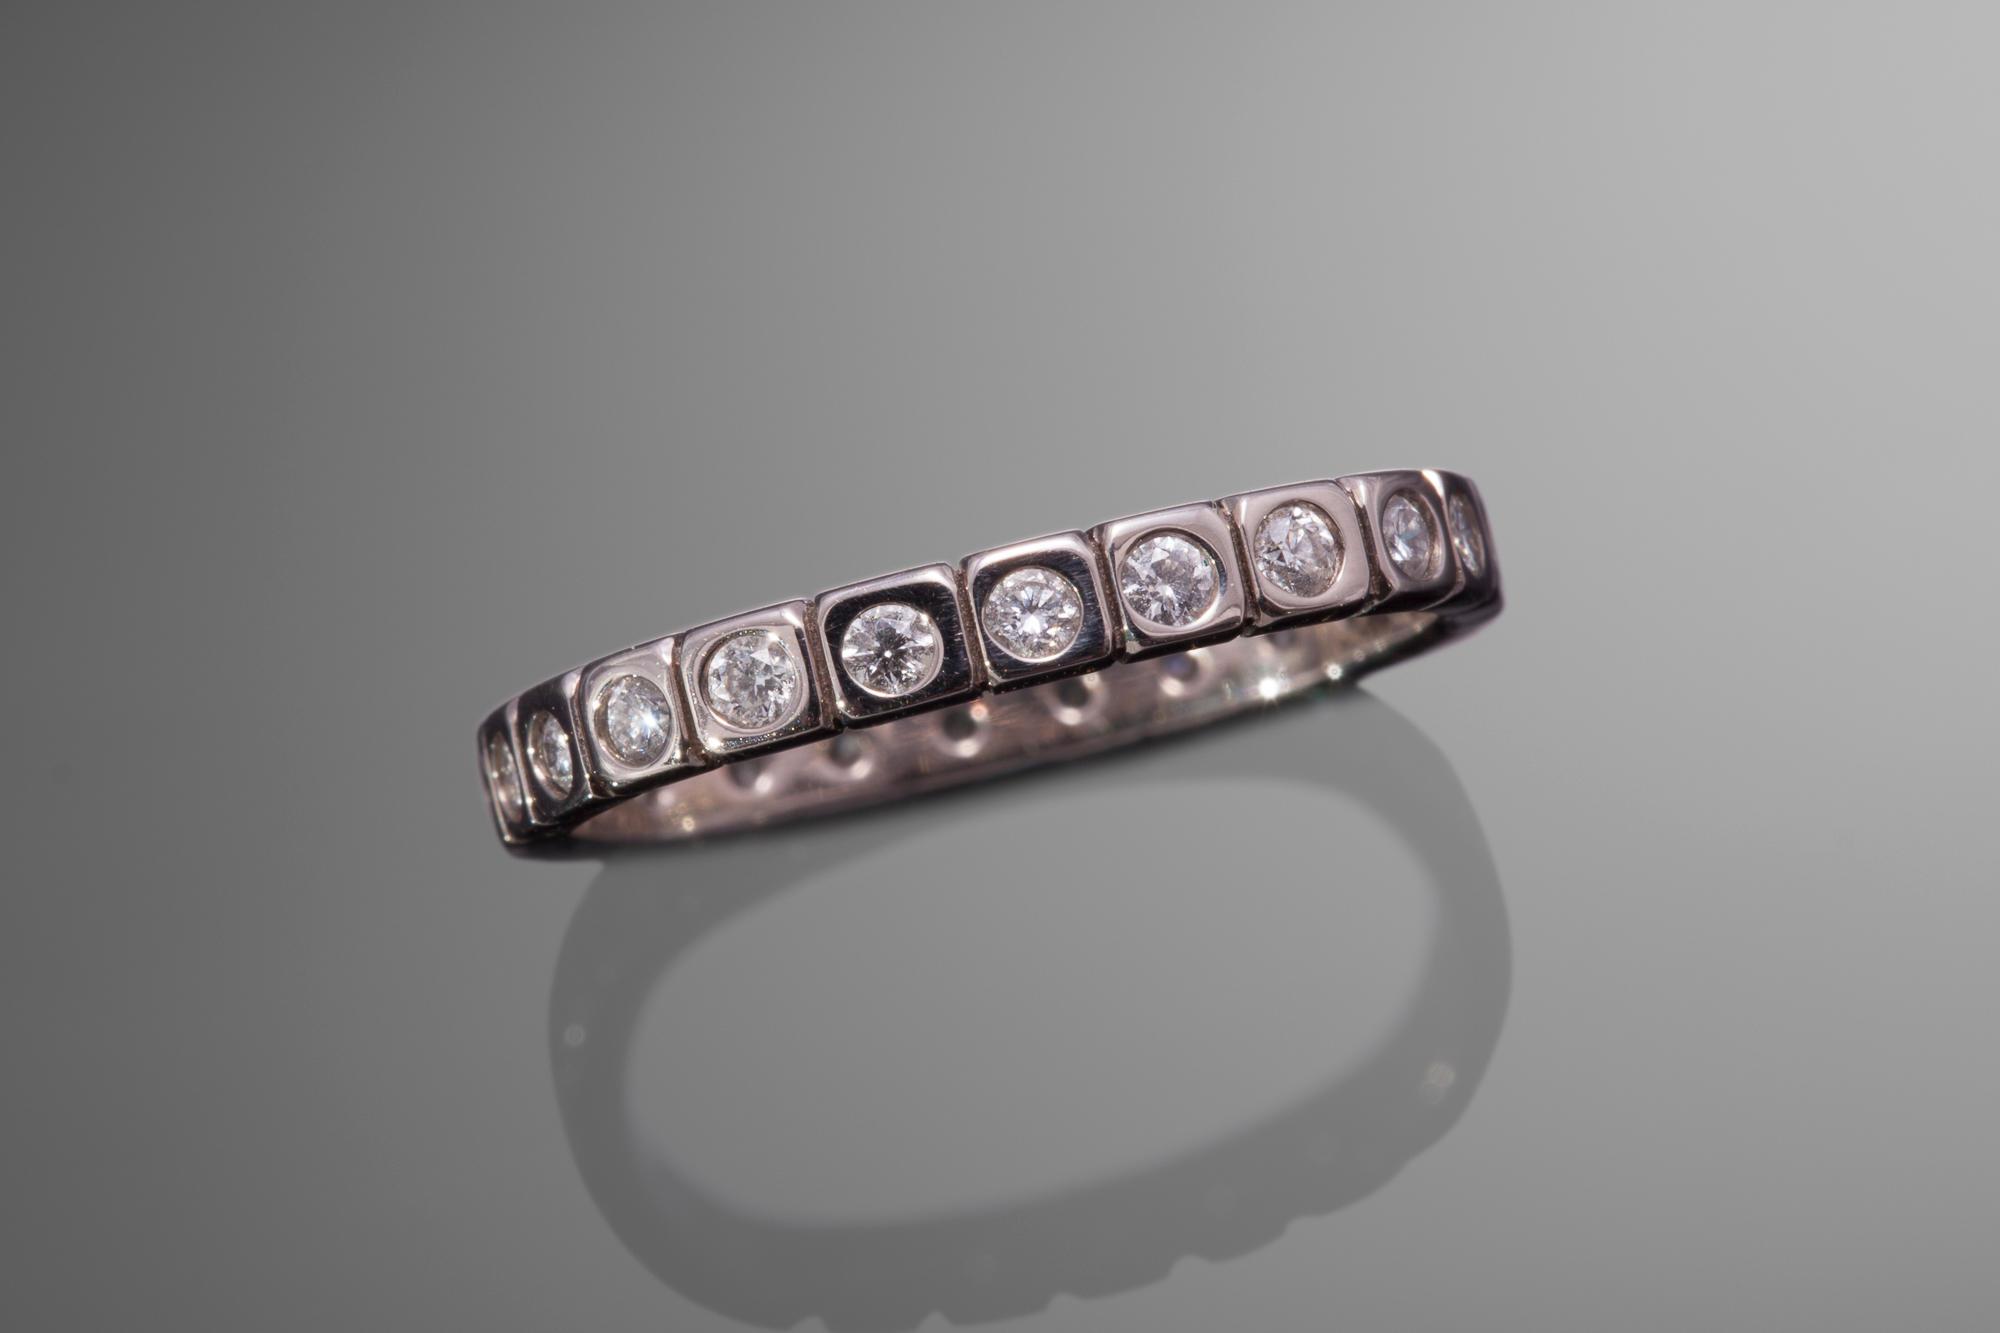 Ormachea Jewelry image 7